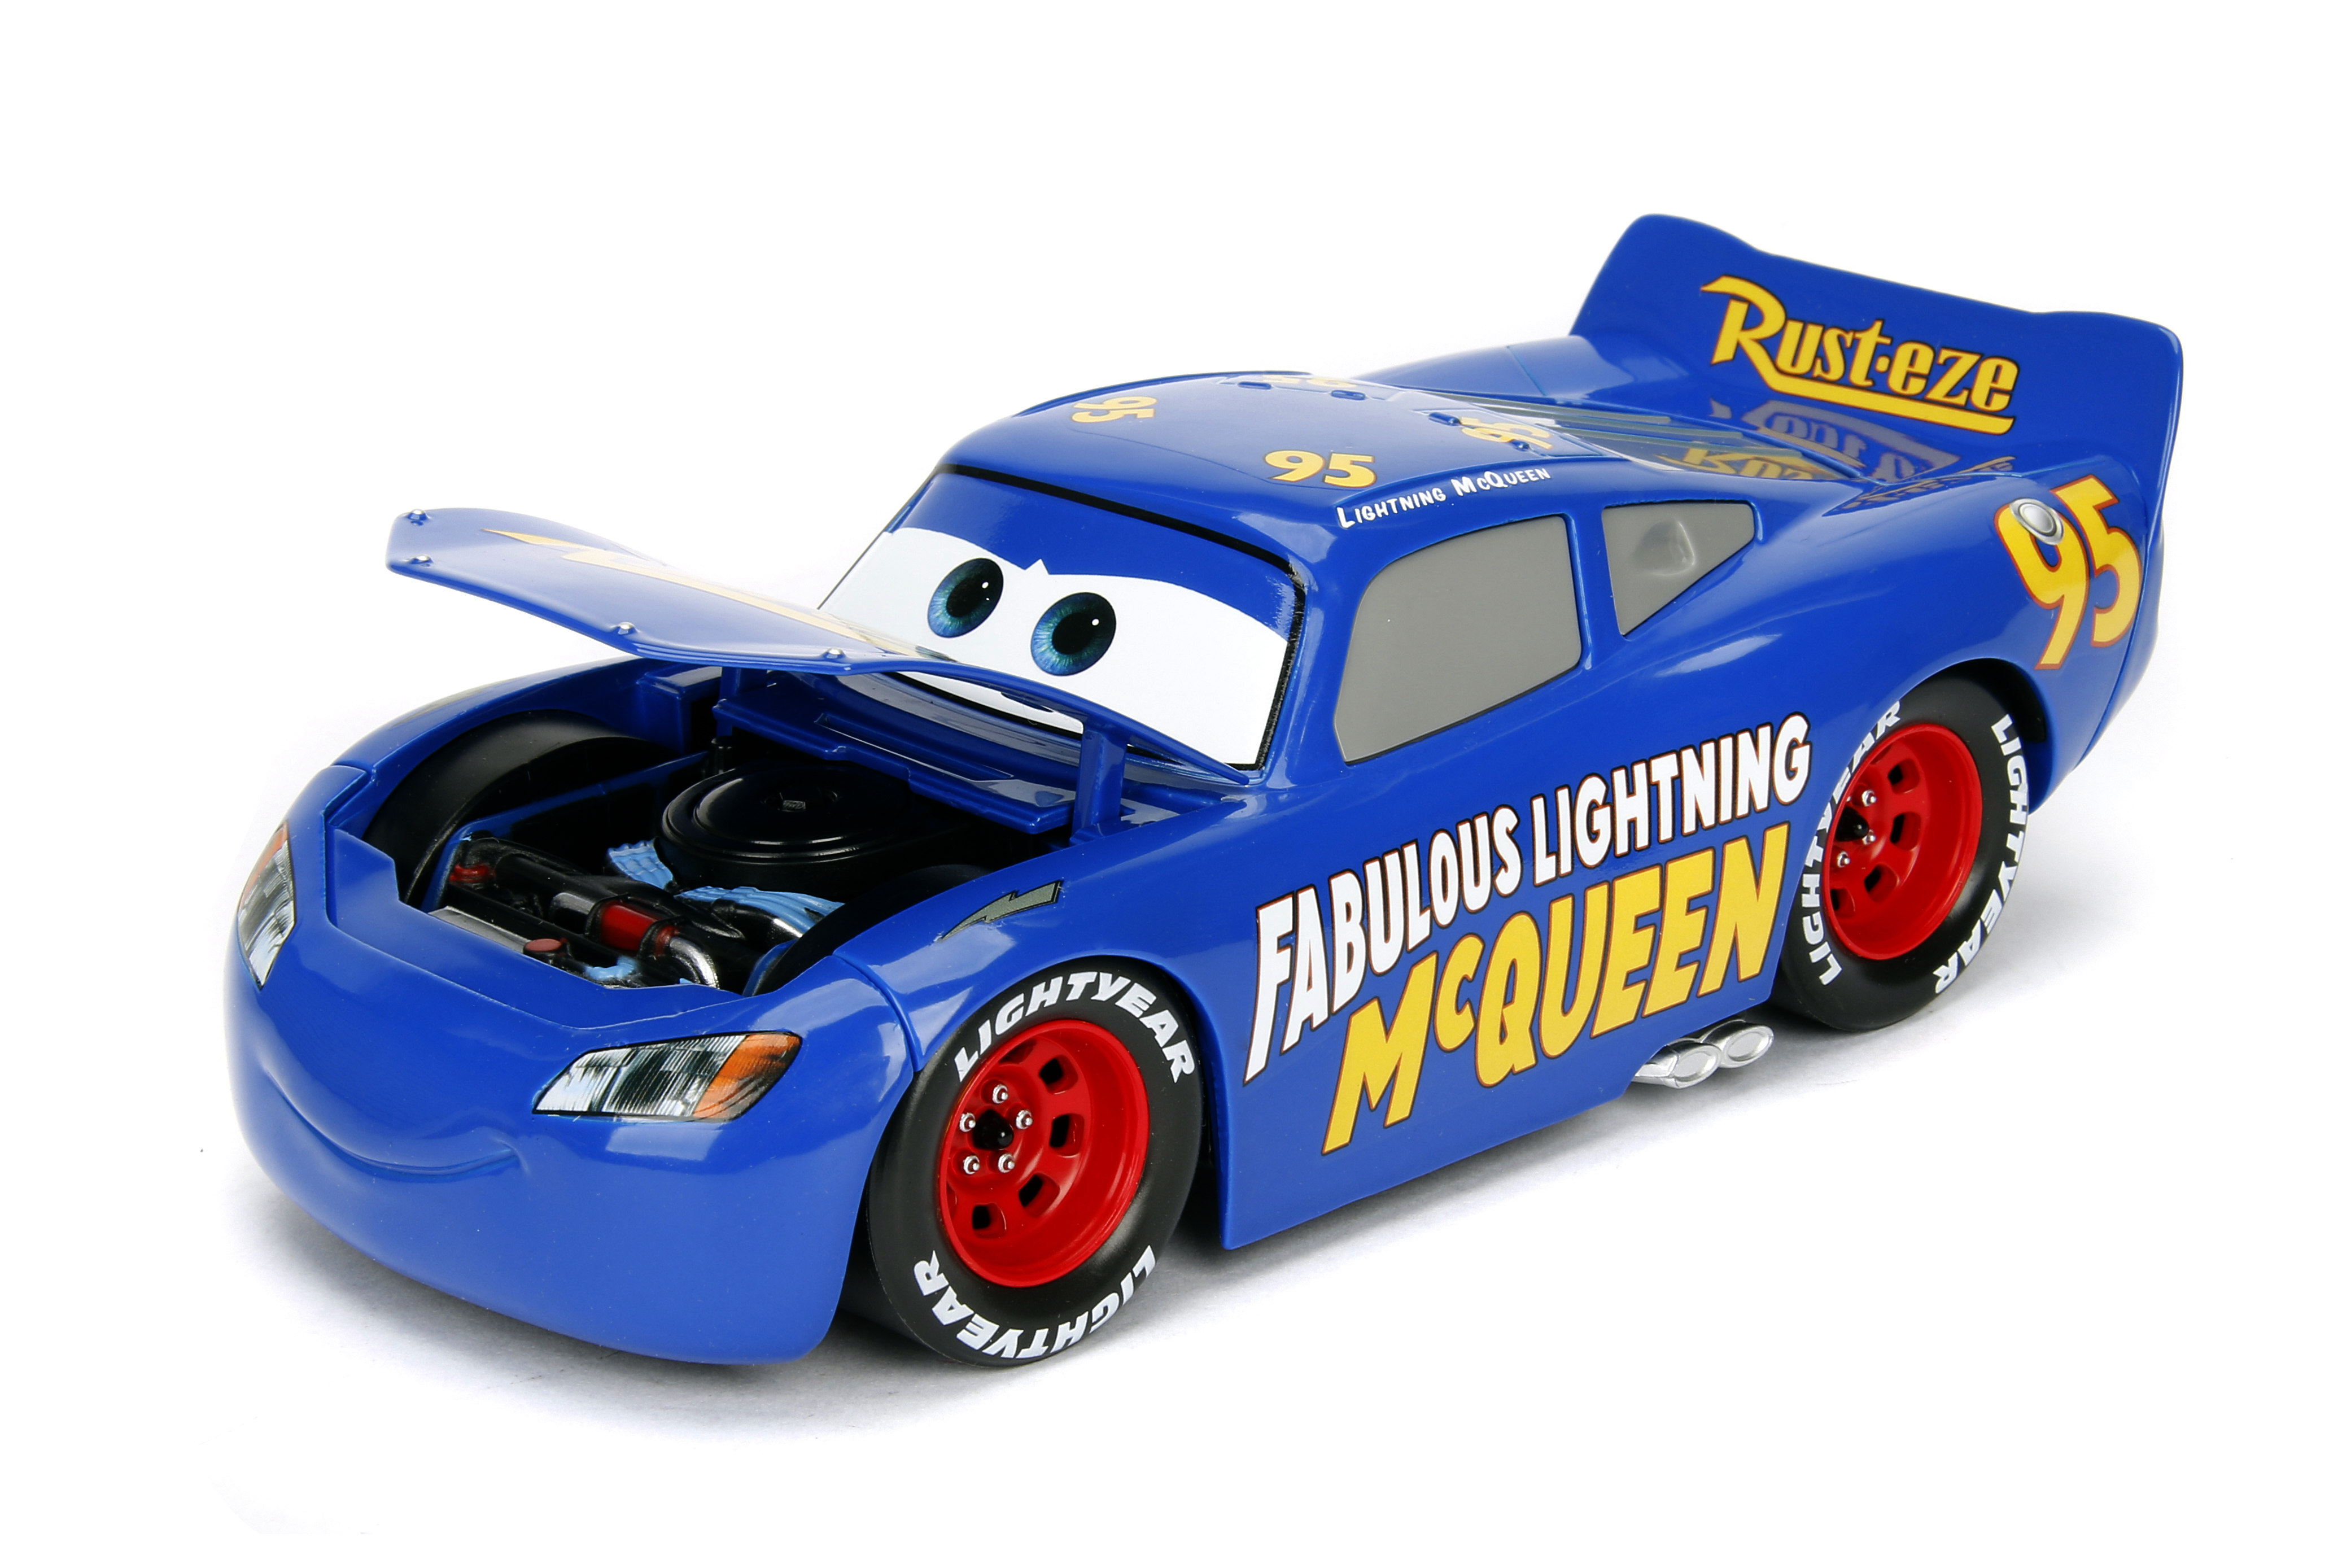 FABULOUS LIGHTNING MCQUEEN 1:24 disney pixar cars NEW diecast metal jada toys